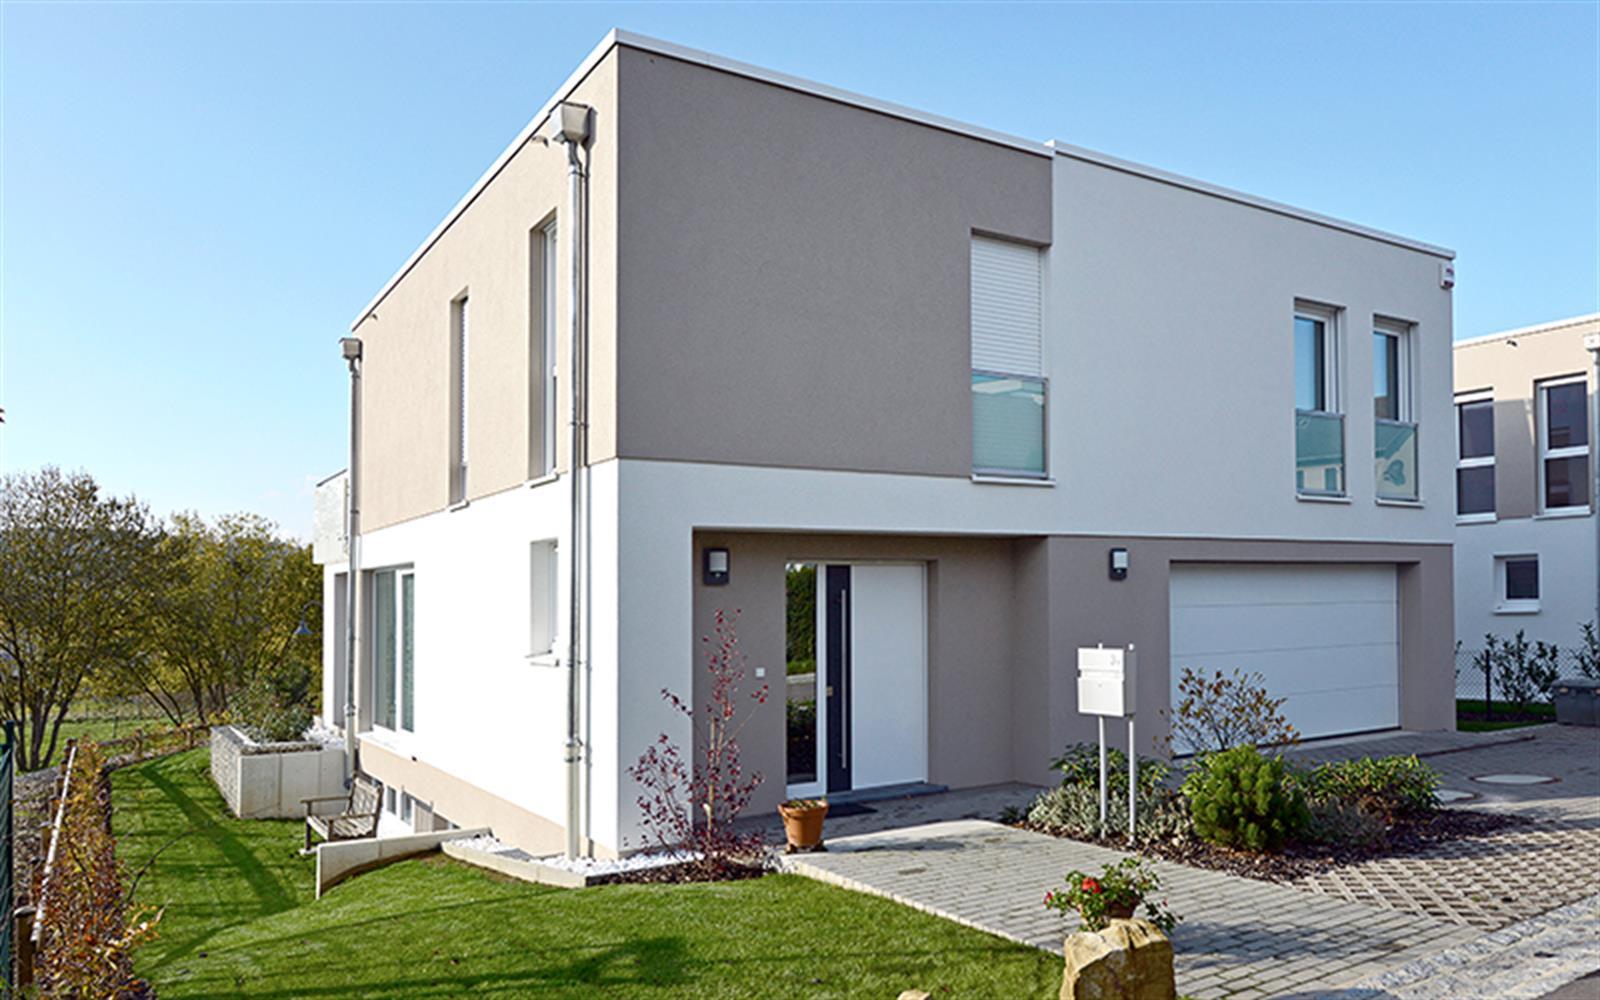 Alpina immobili re achat location vente immobilier for Site vente immobilier